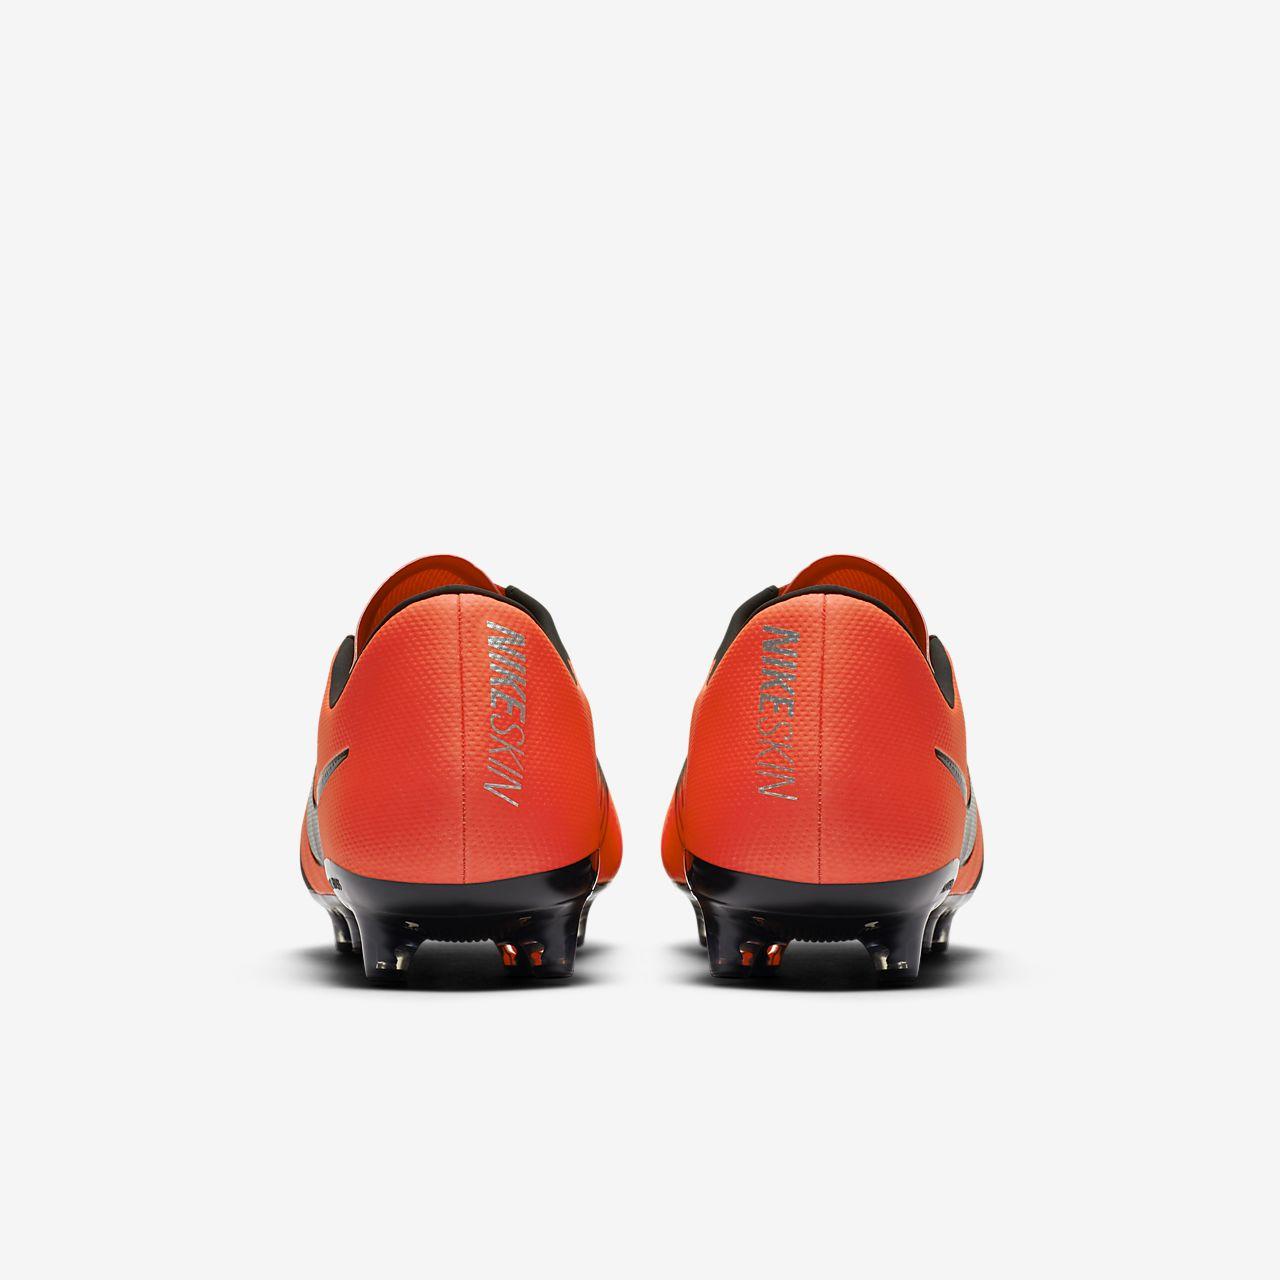 newest 9c4bf 5cdb3 ... Nike Phantom Venom Pro AG-Pro Artificial-Grass Football Boot